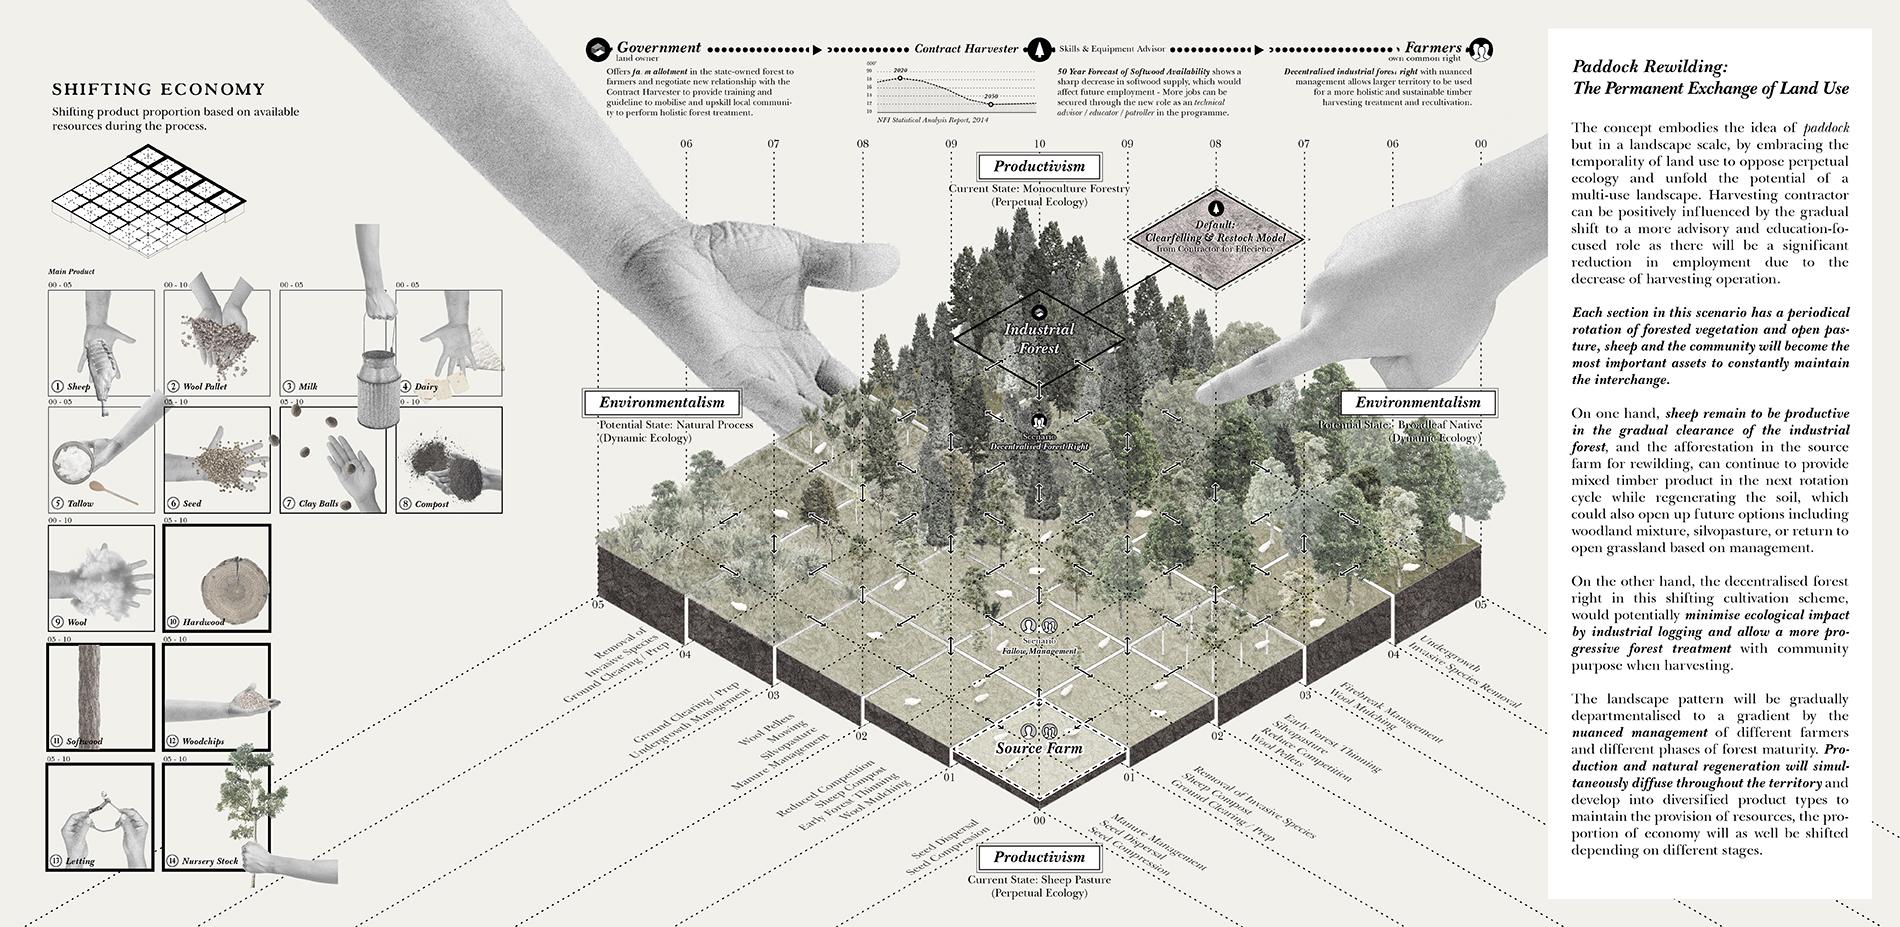 Paddock Rewilding: The Permanent Exchange of Land Use